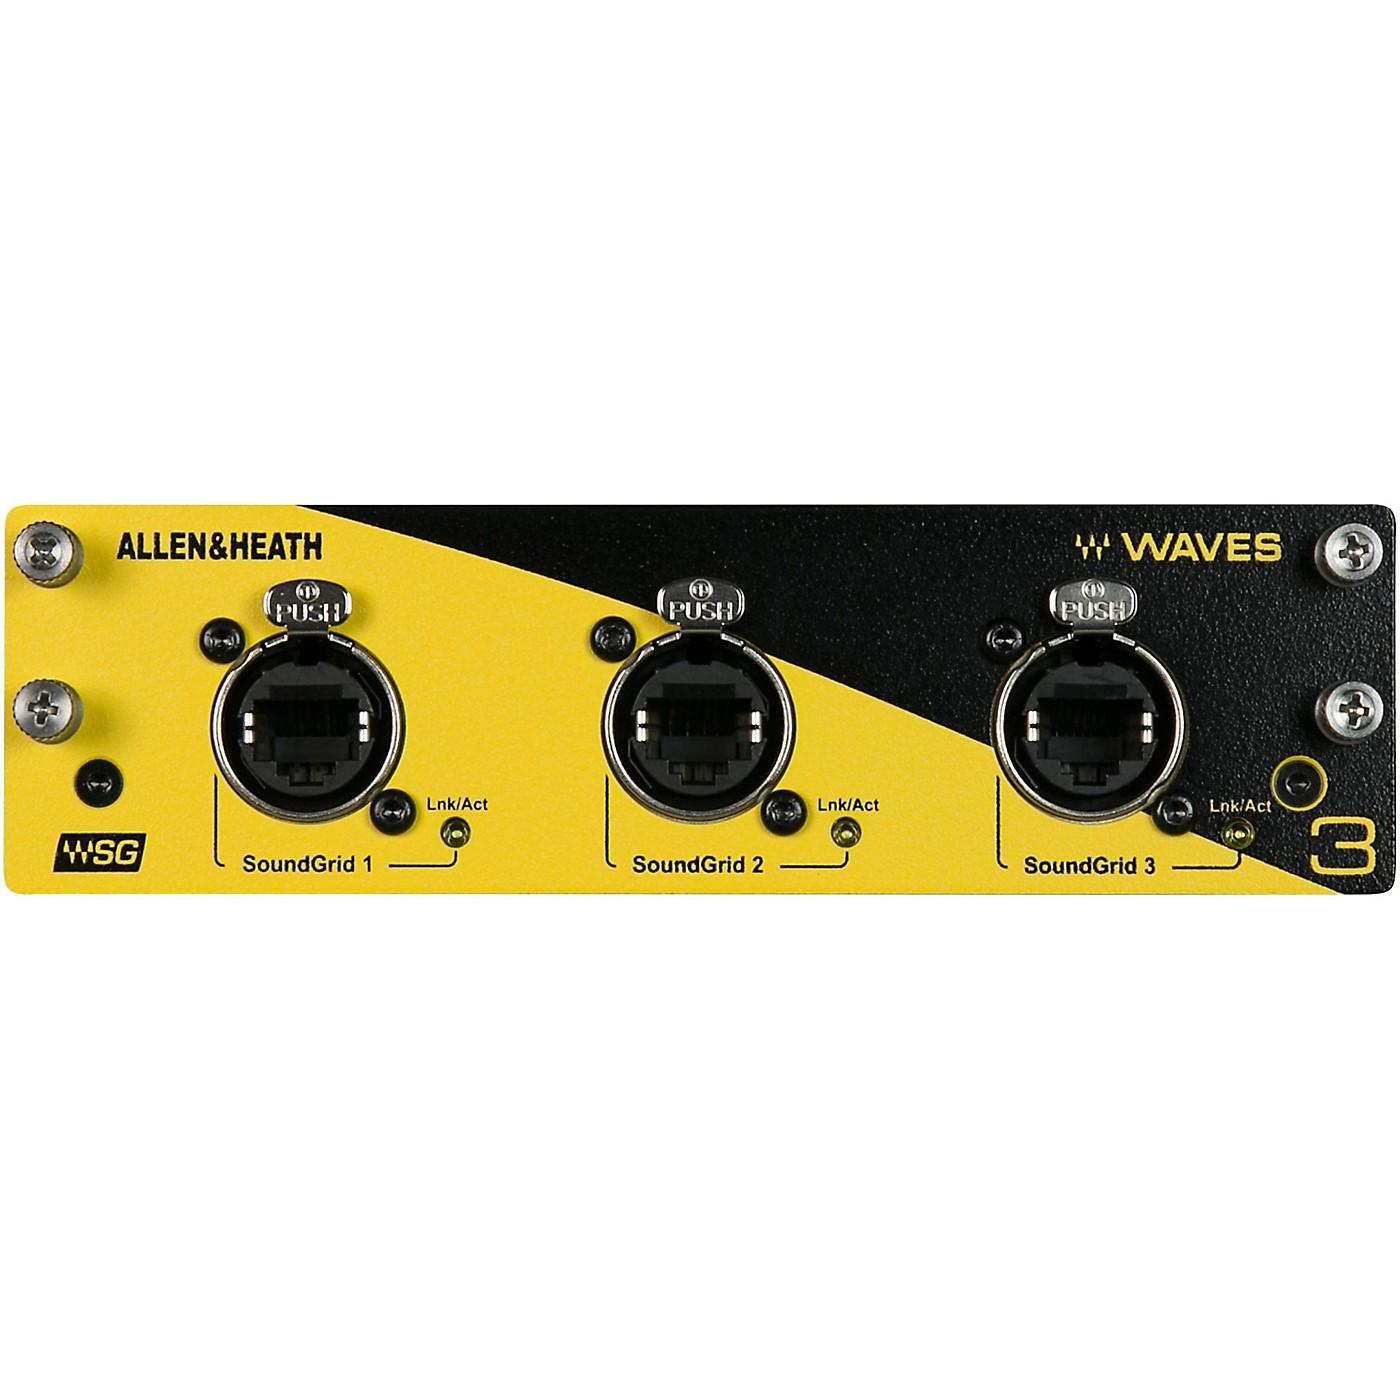 Allen & Heath WAVES V3 128x128 dLive Module thumbnail